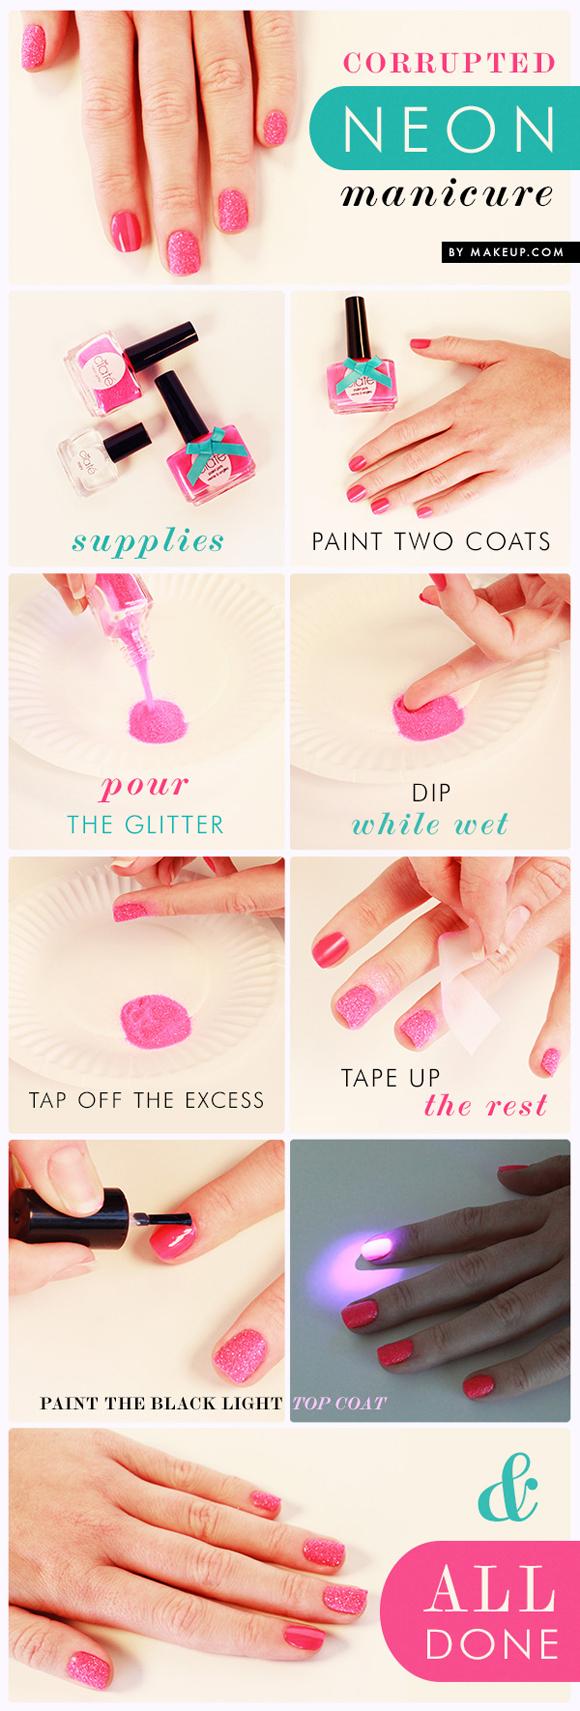 Corrupted-Neon-Manicure-bop